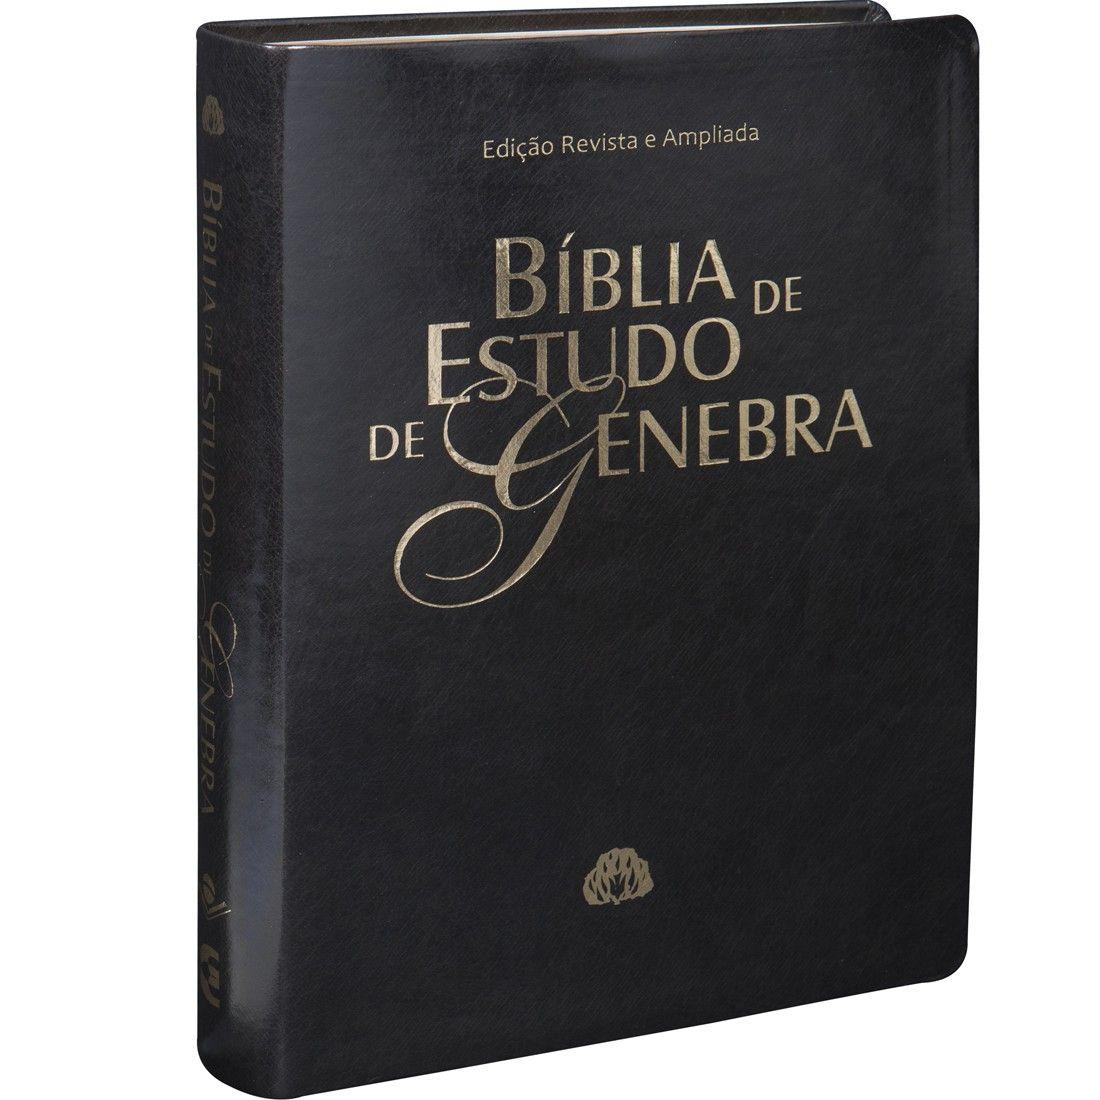 BÍBLIA DE ESTUDO DE GENEBRA - PRETA